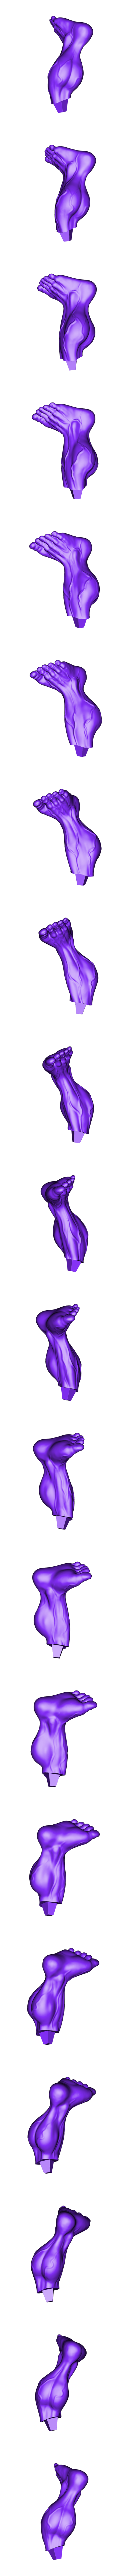 Rleg_225mm.stl Download STL file Hulk Angry - Super Hero - Marvel 3D print model • 3D print model, Bstar3Dart